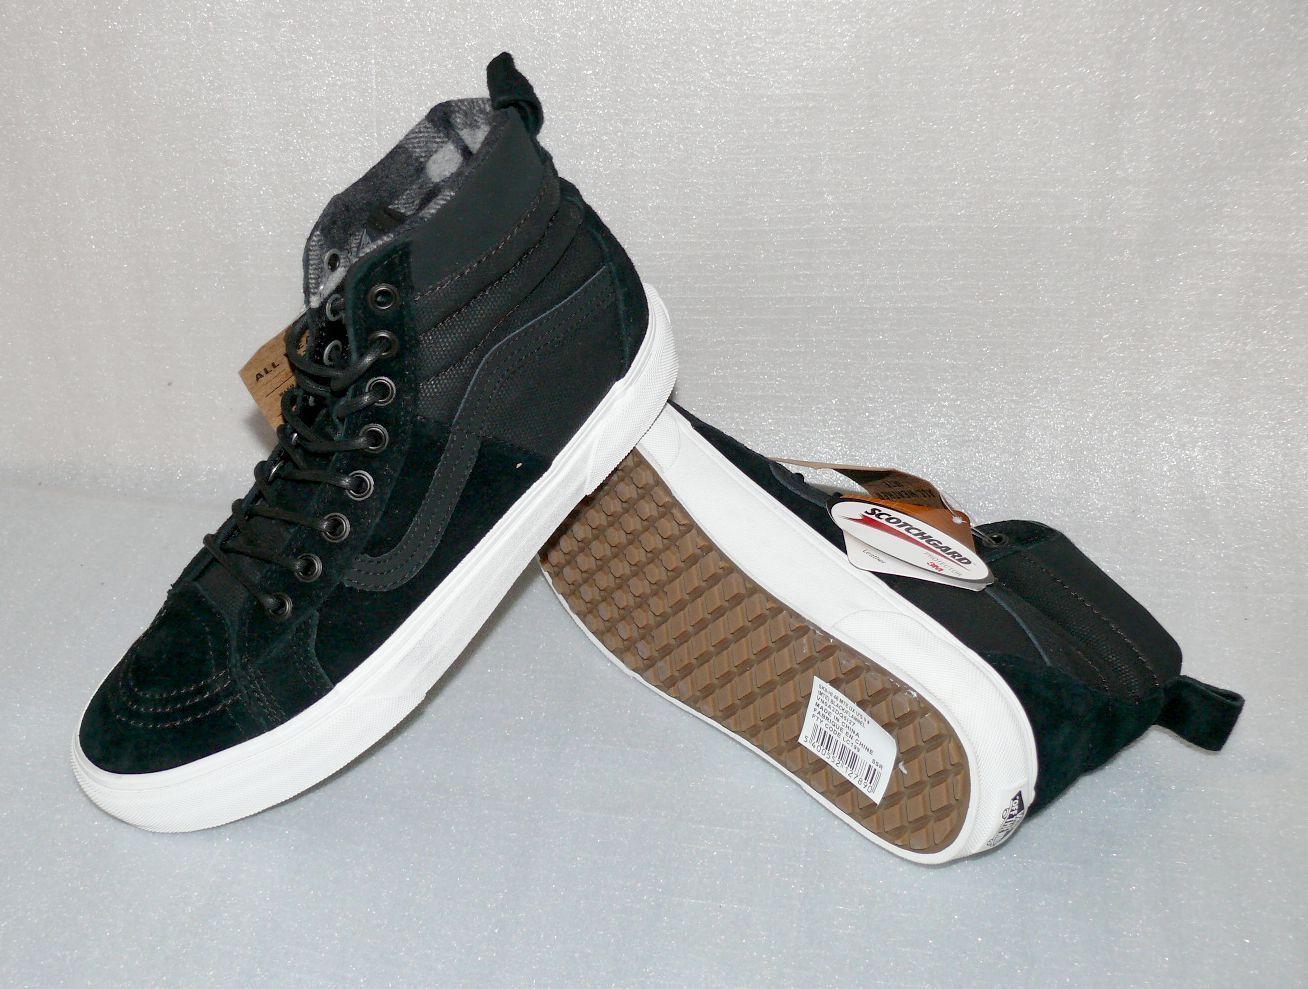 Vans SK8 HI 46 MTE DX Rauleder Herren Schuhe Freizeit Boots 42 US9 Black Allwett